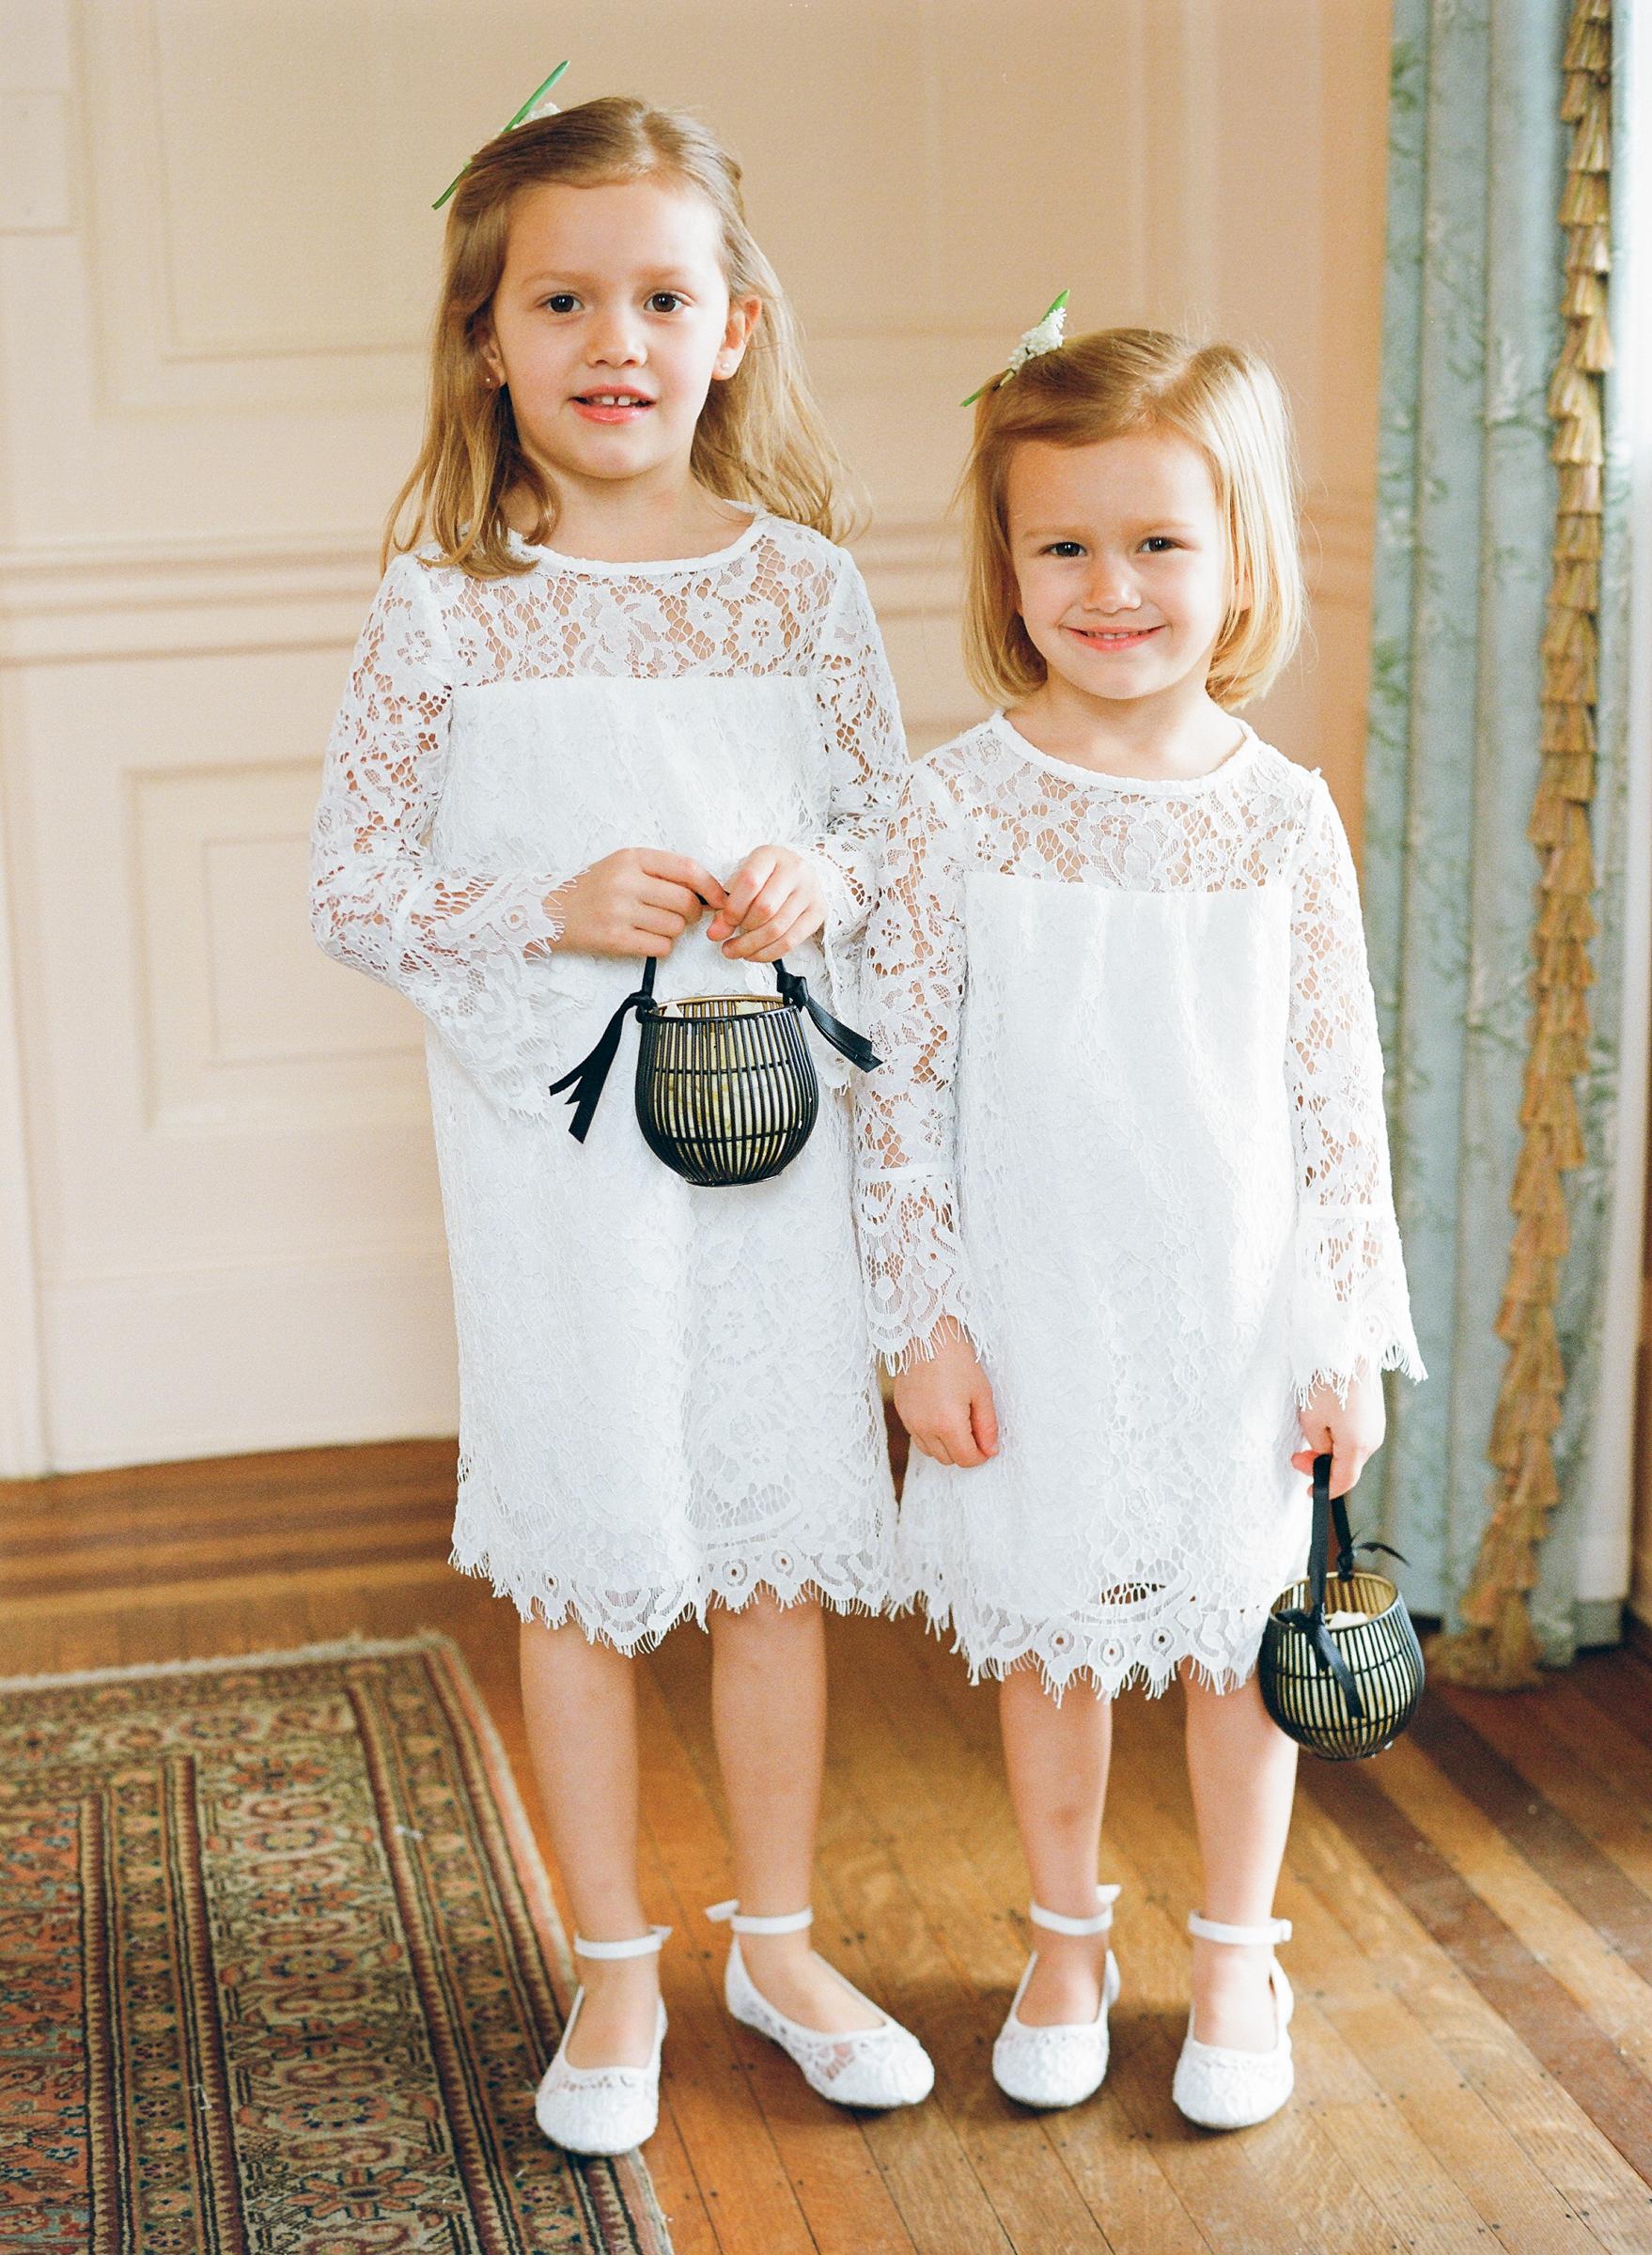 hamida charlie charleson wedding flower girls